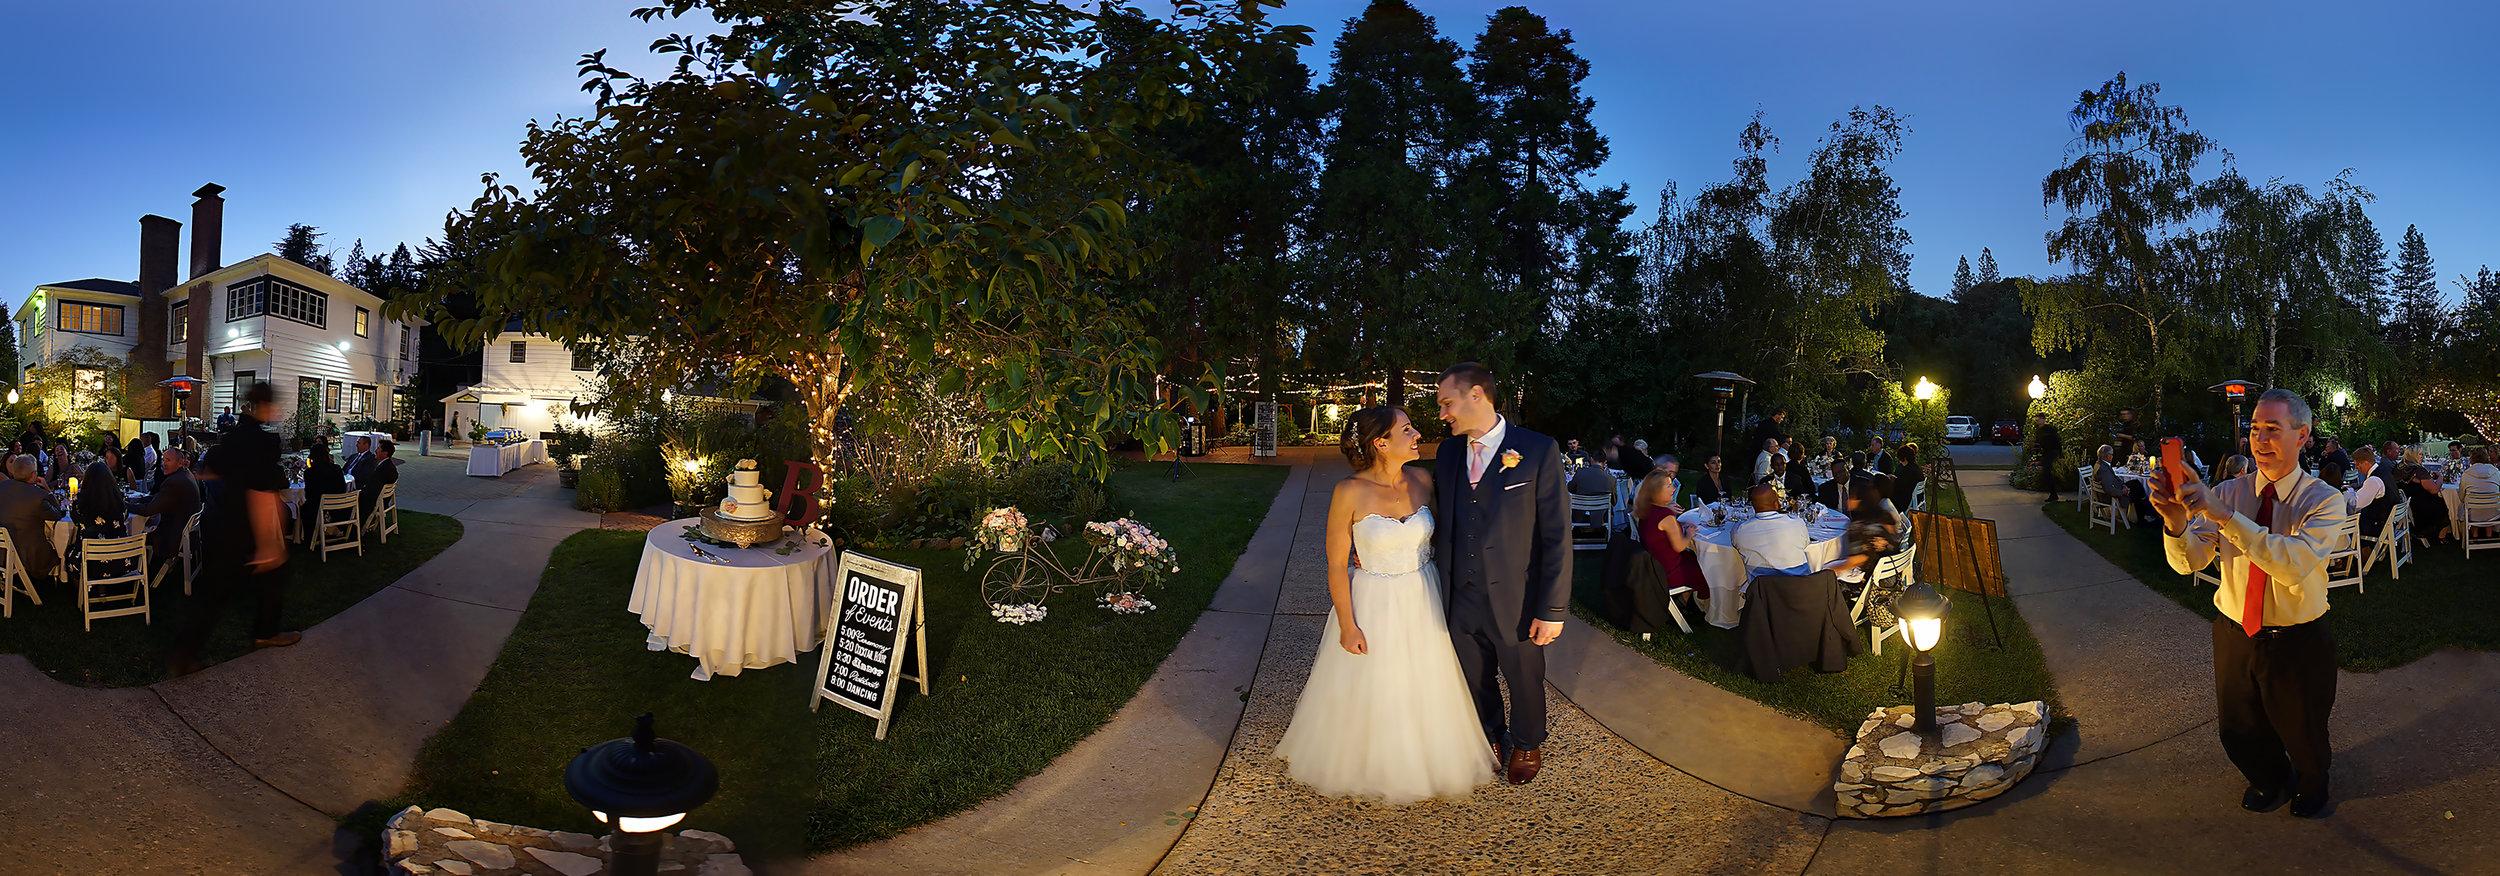 Wedding Panorama.jpg